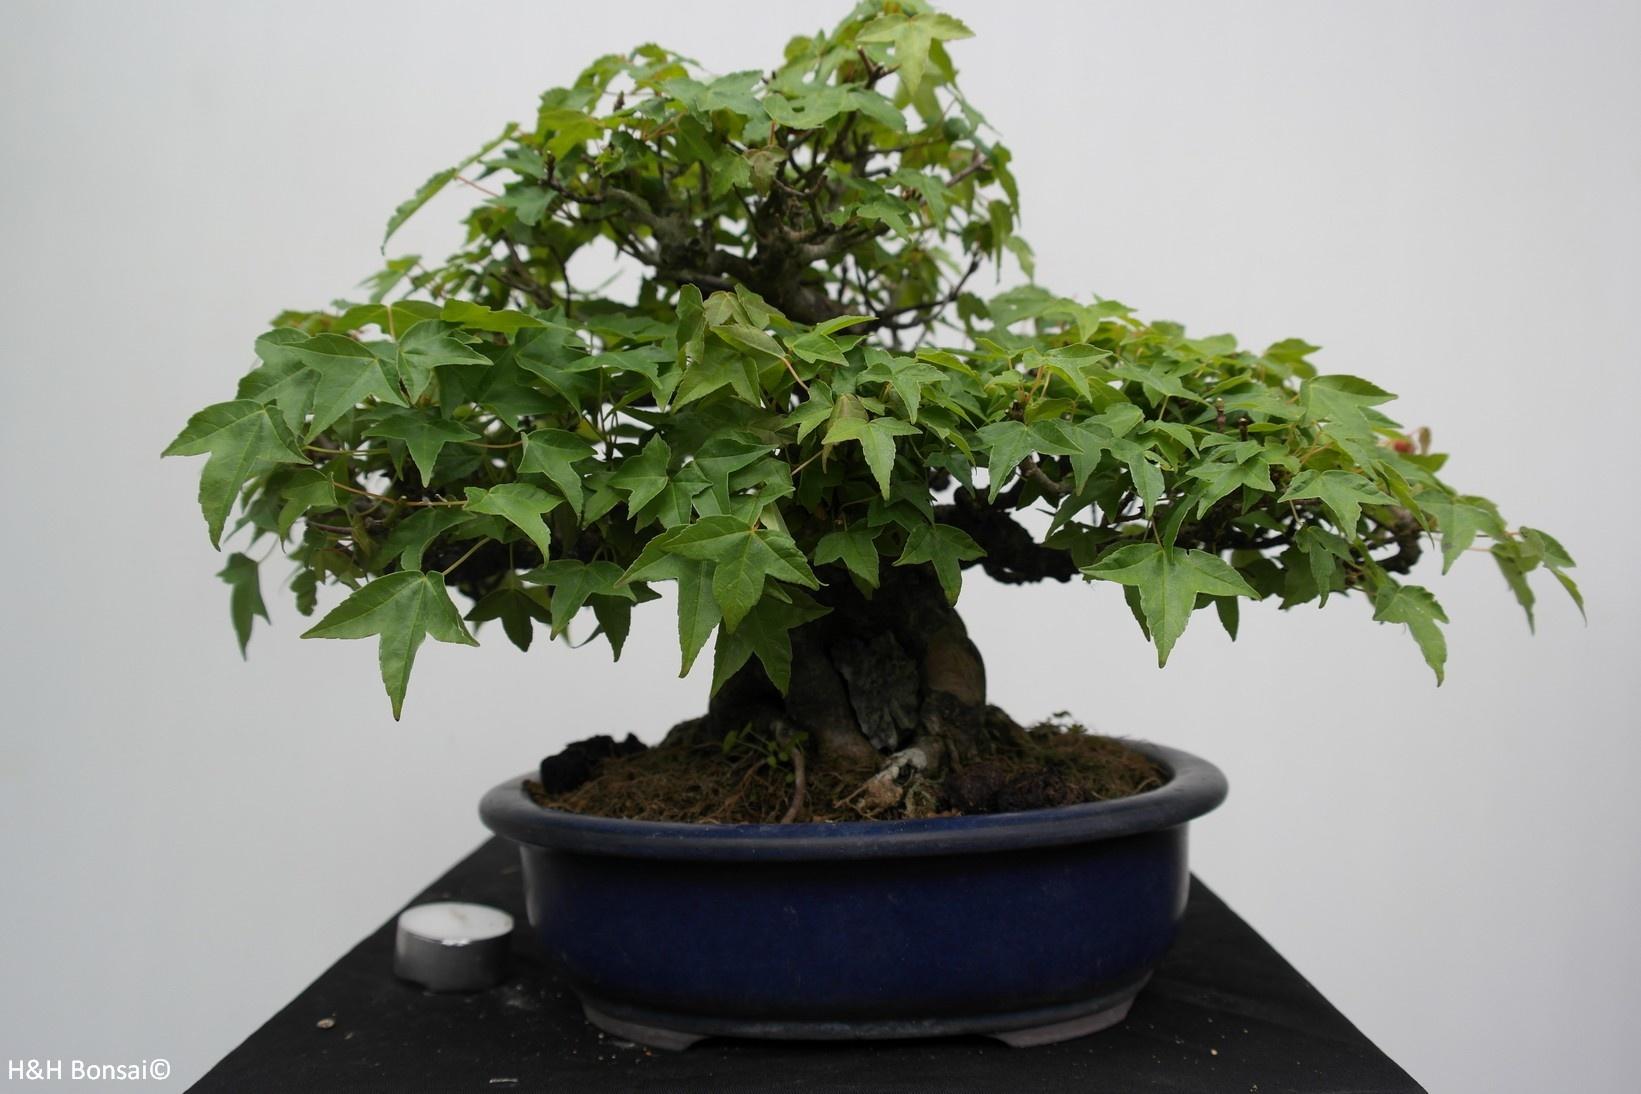 Bonsai Acer buergerianum, Drietands Esdoorn, nr. 7513A